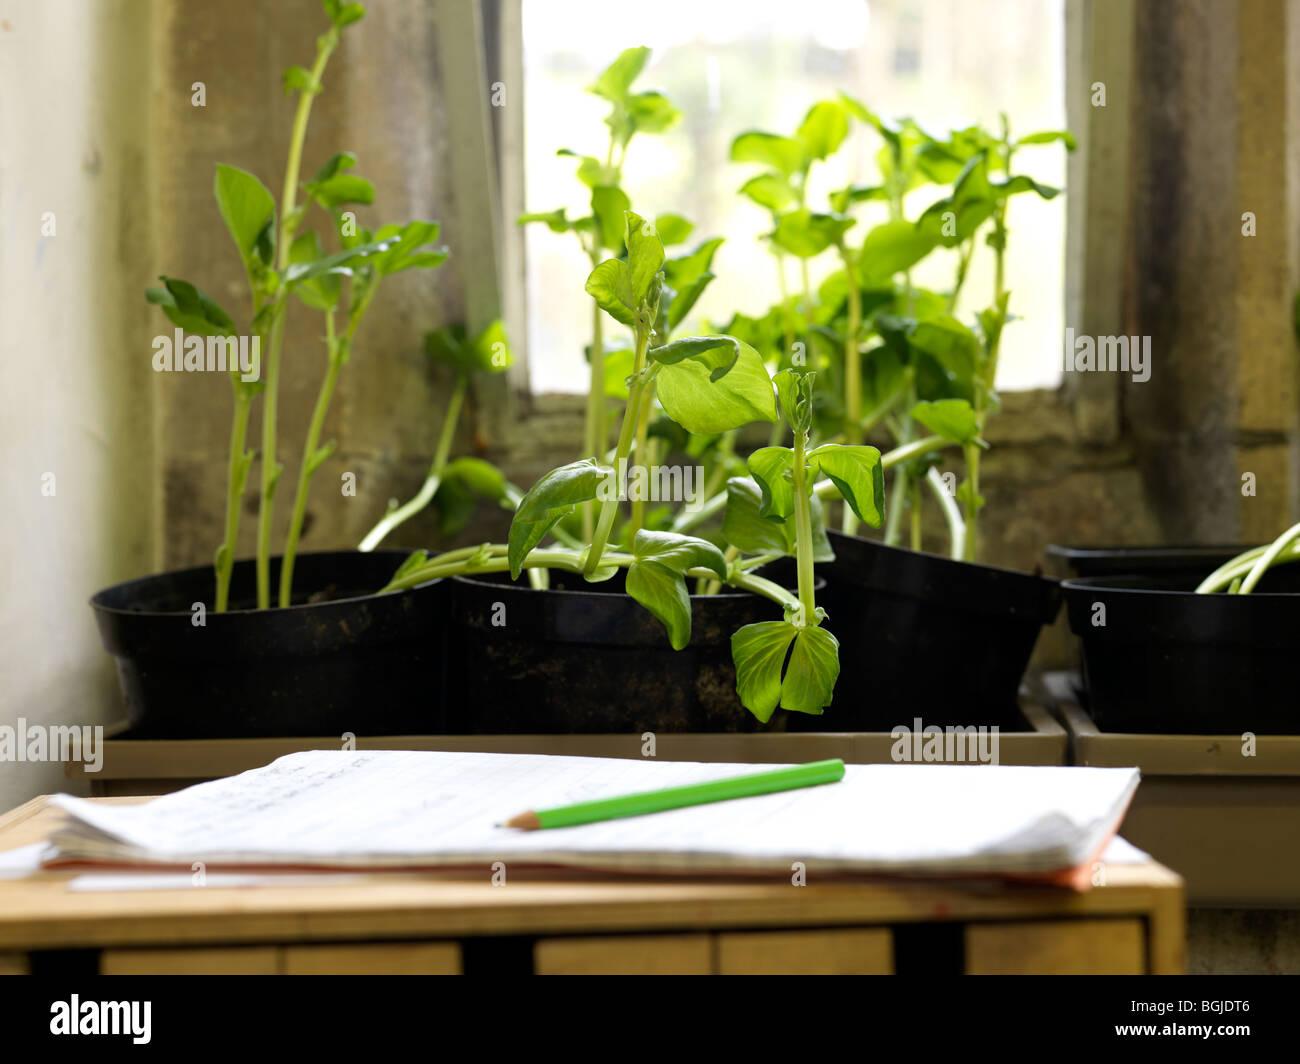 plants growing in classroom window - Stock Image